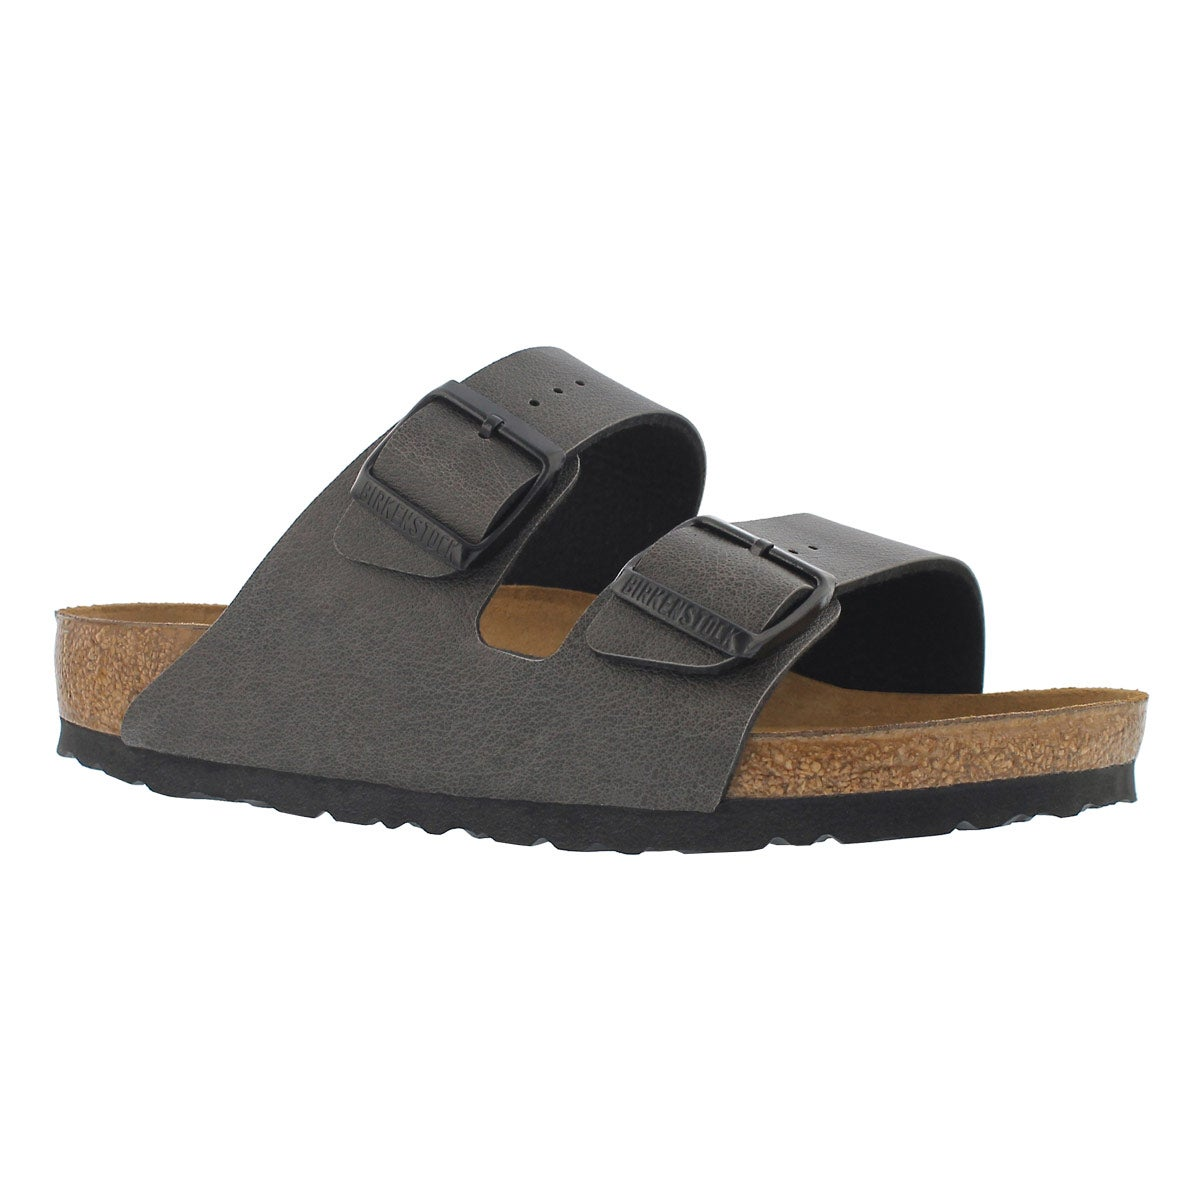 Women's ARIZONA anthracite BF 2 strap sandals